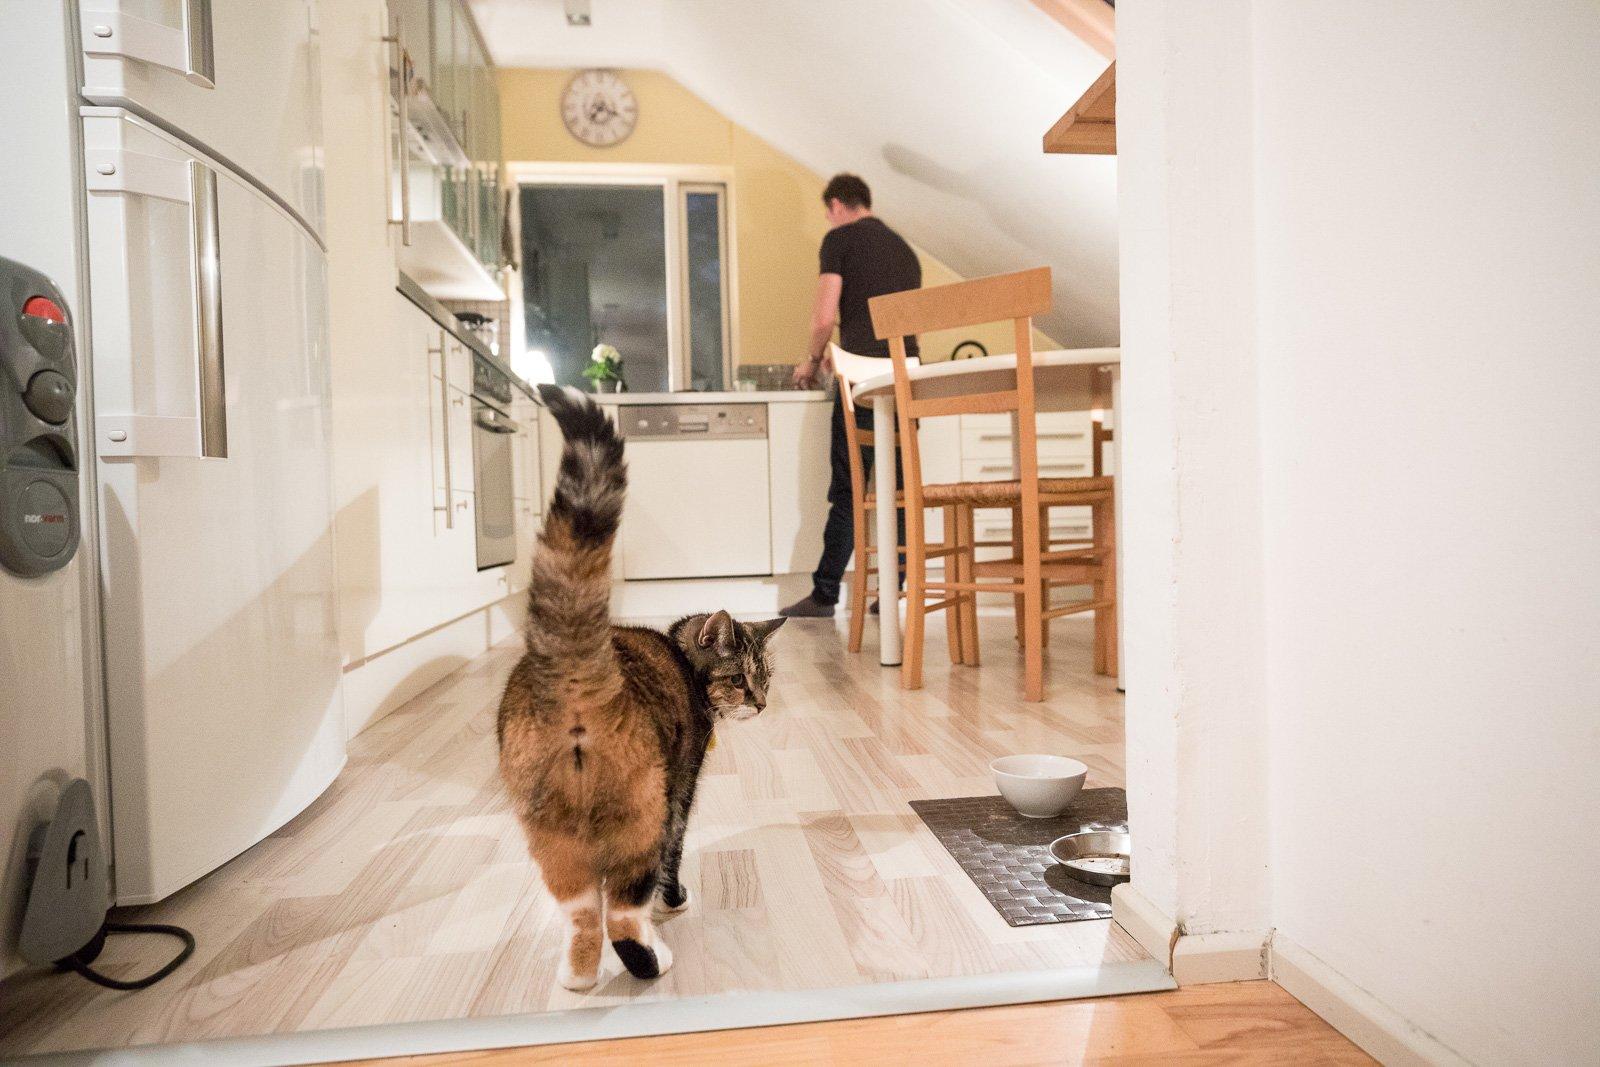 Icelandic Cat Gets Stuck In Mud, Hilarity Ensues